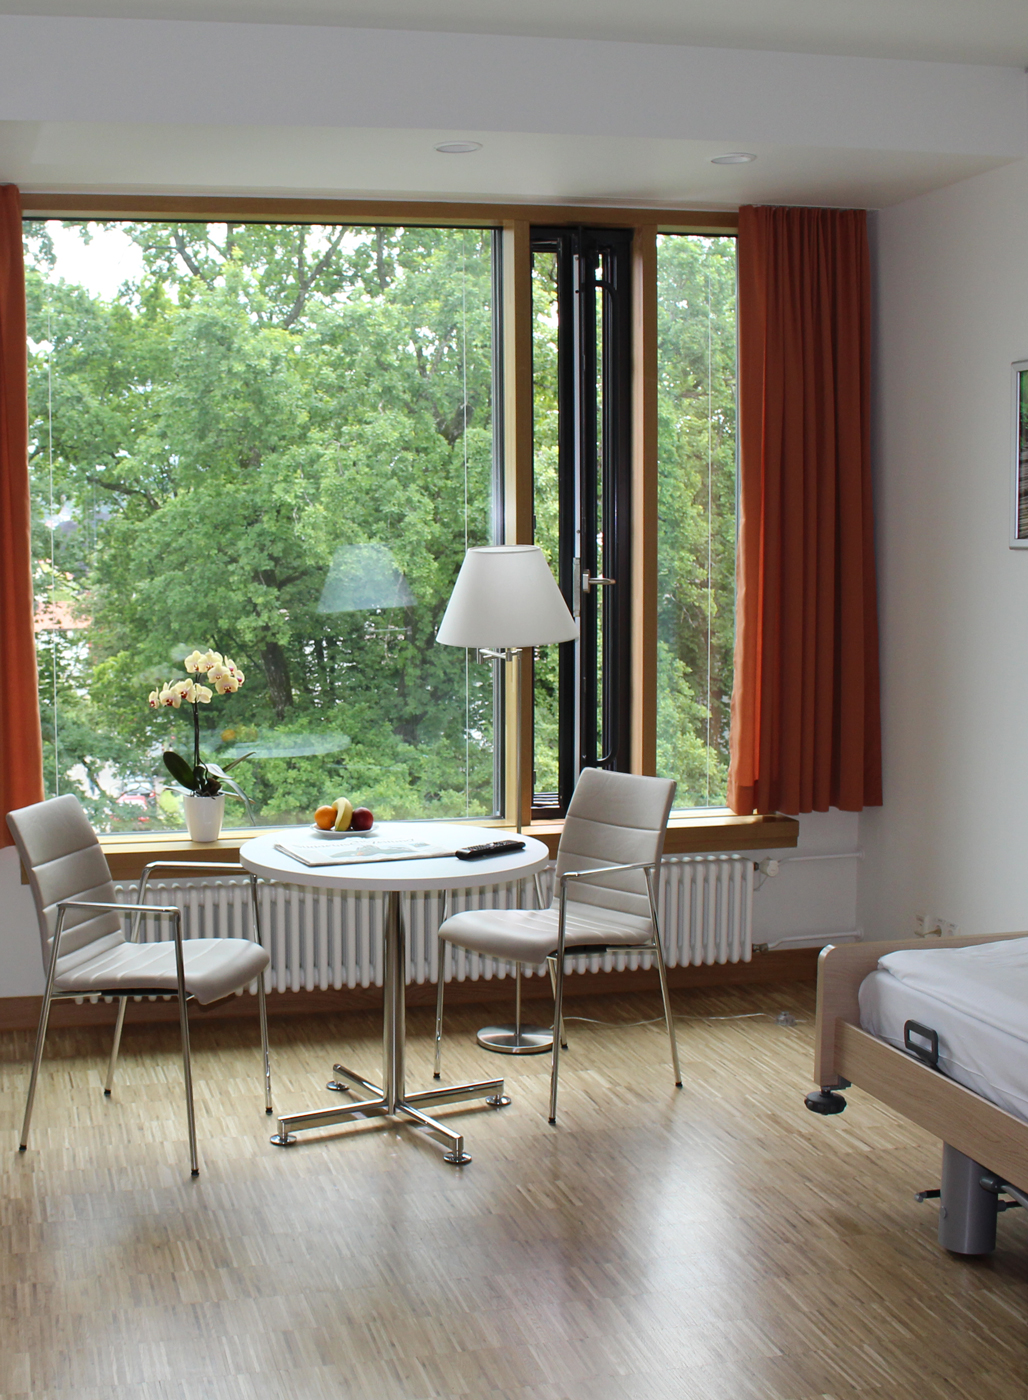 Patientenzimmer, Bezirkskrankenhaus Kempten.